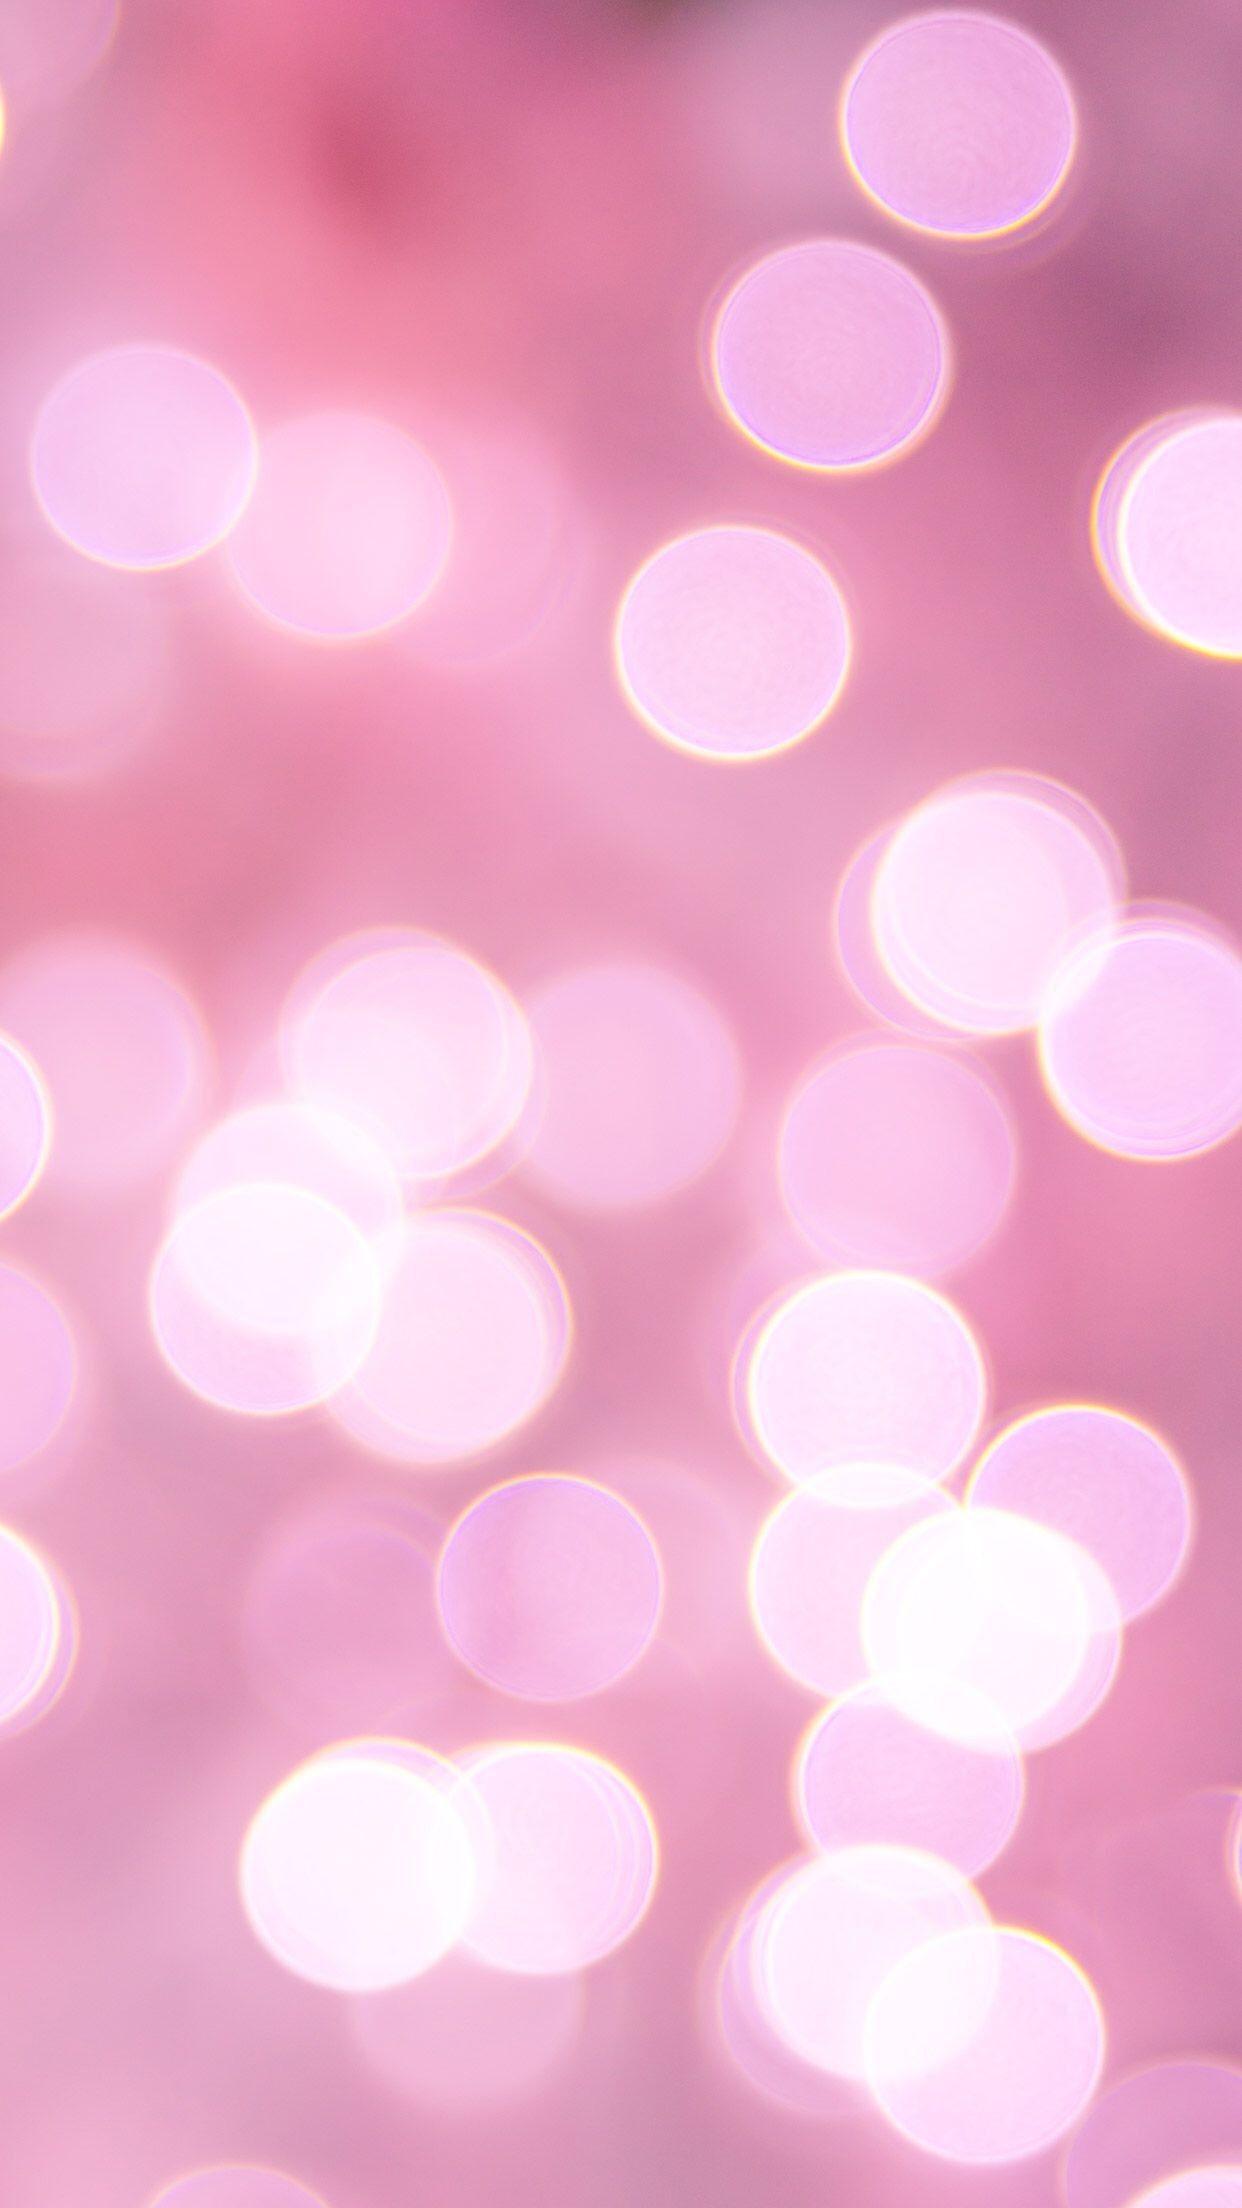 Elegant Girly Wallpapers Hd For Desktop Happy Wallpaper Phone Wallpaper Images Pink Wallpaper